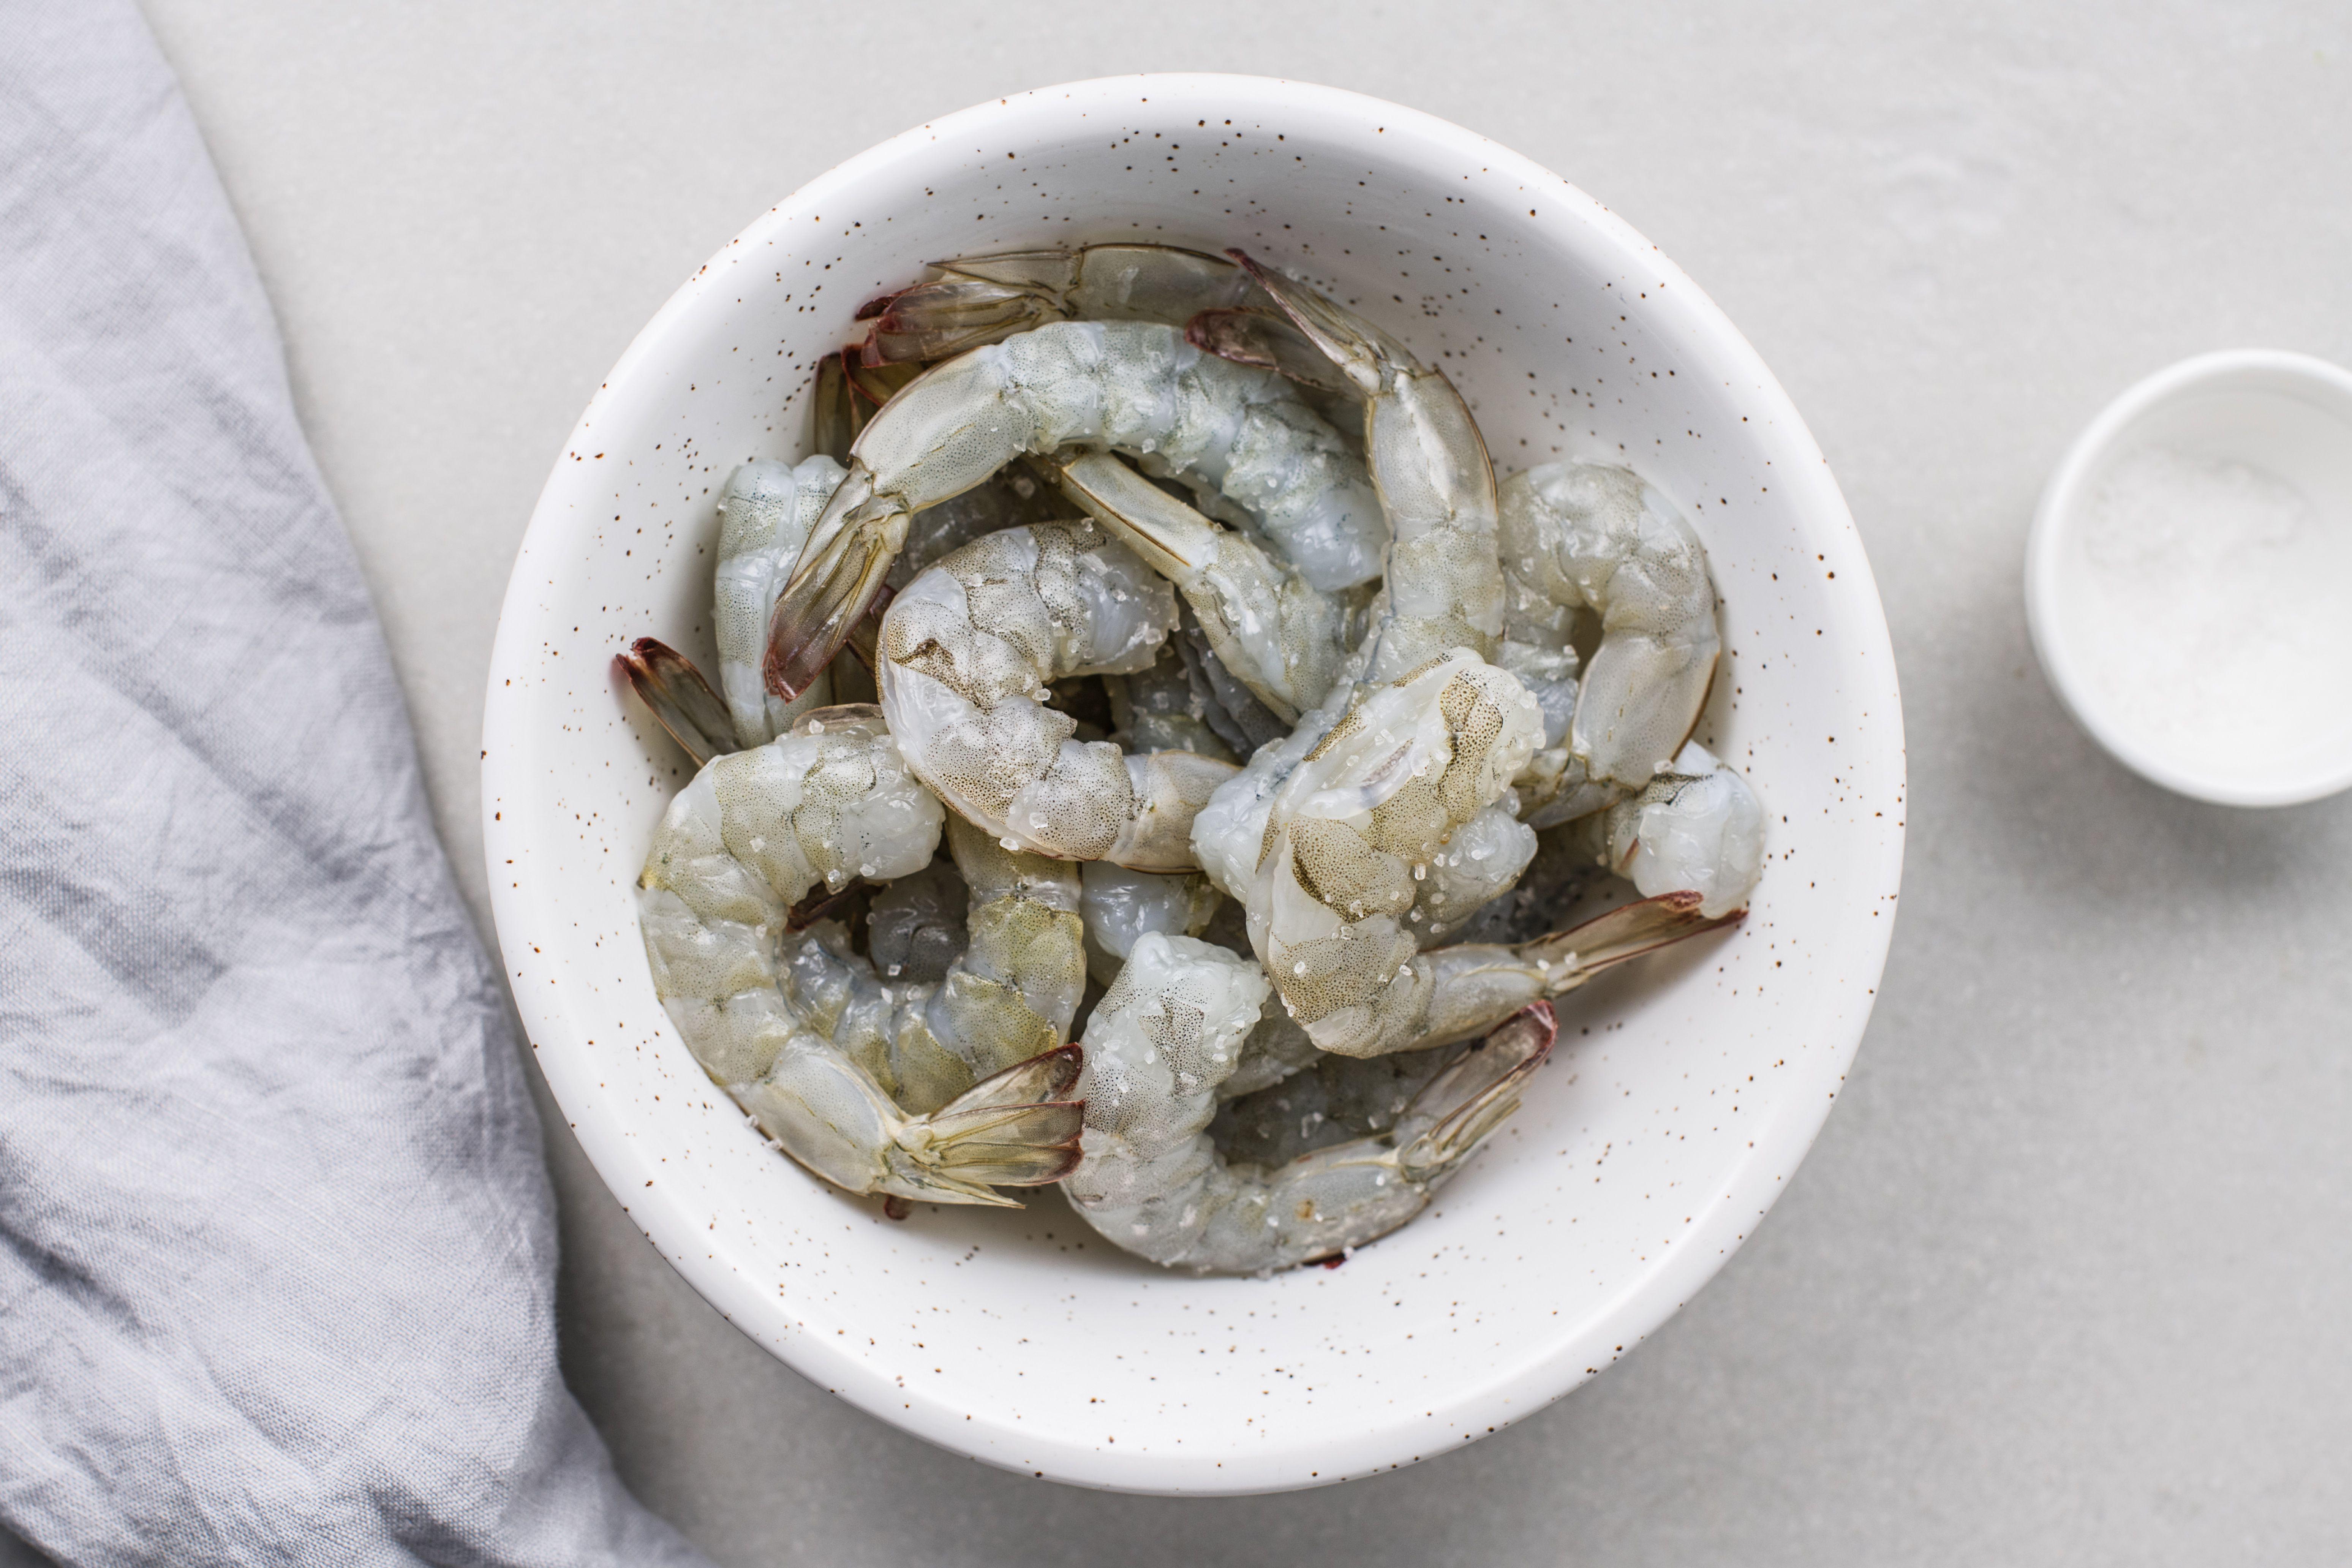 sprinkle shrimp lightly with salt for the Panko-Fried Shrimp Recipe